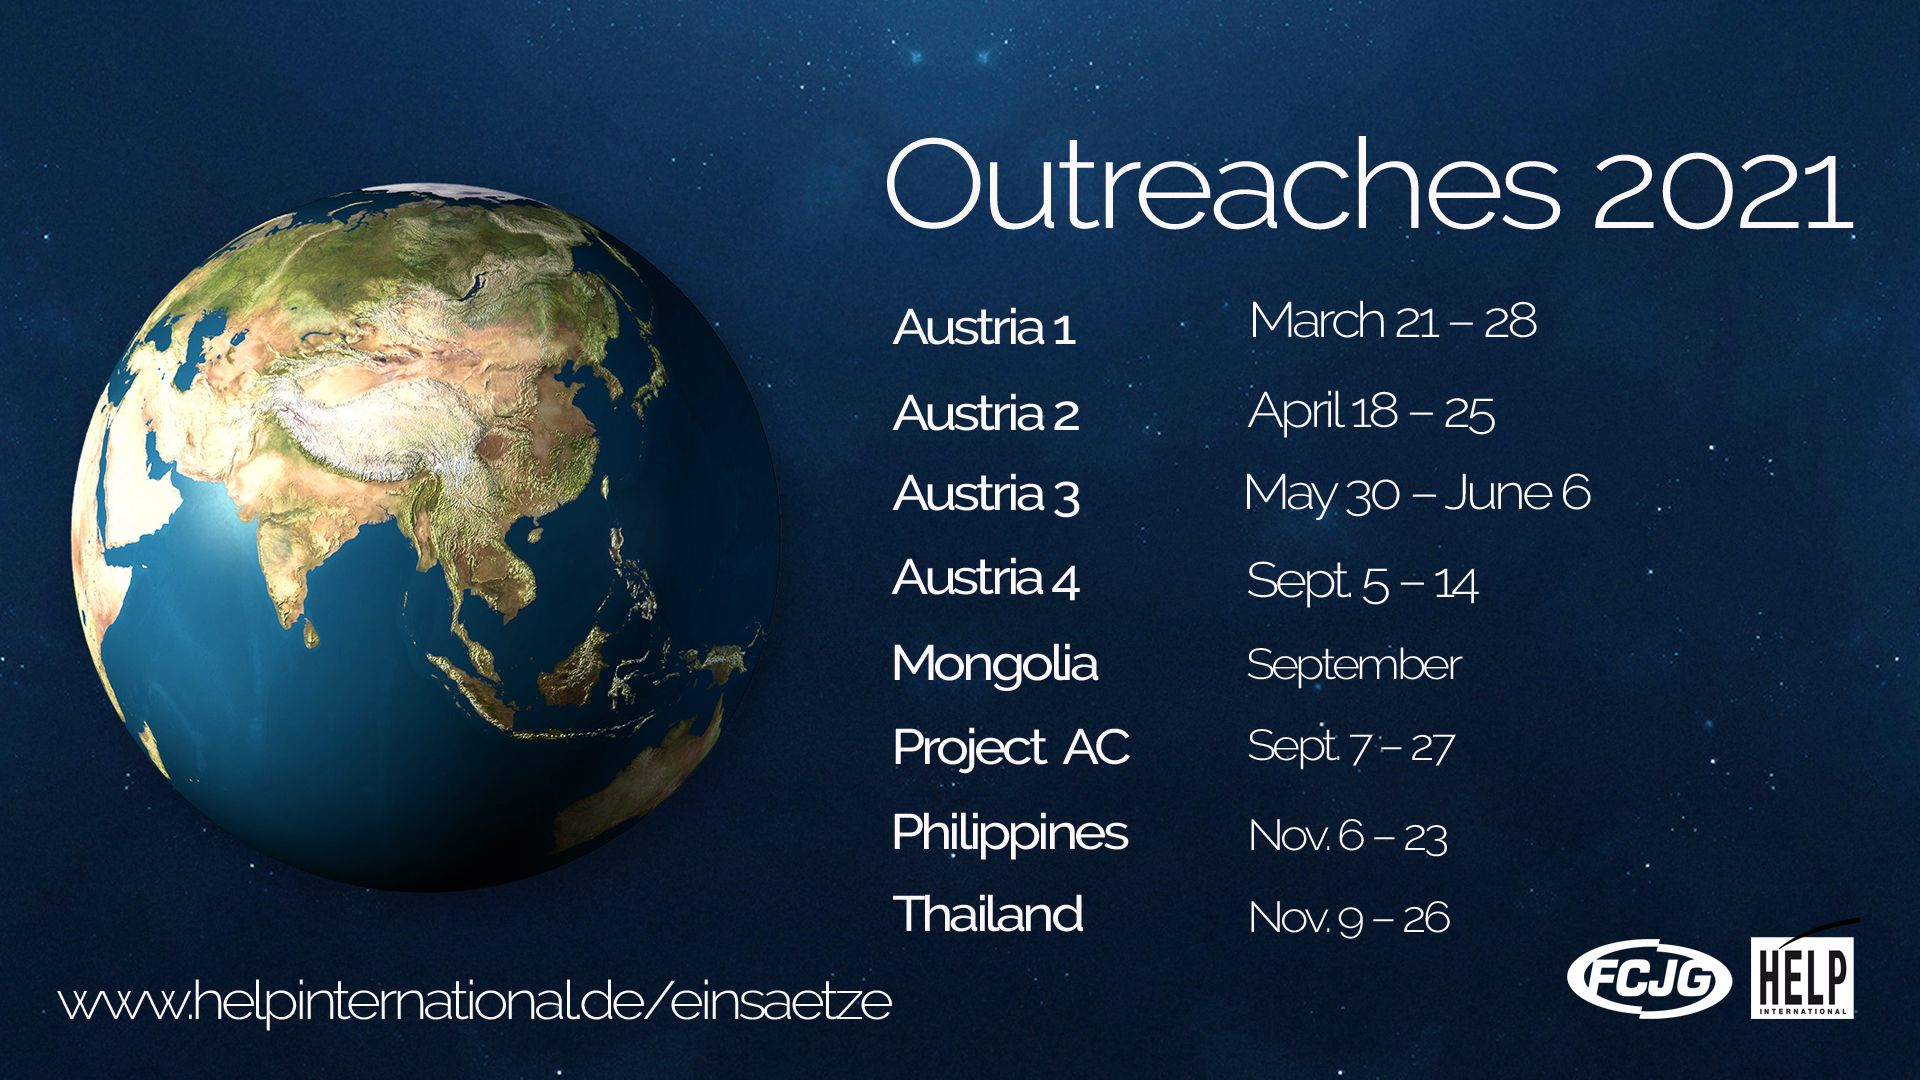 Outreaches_2021_new